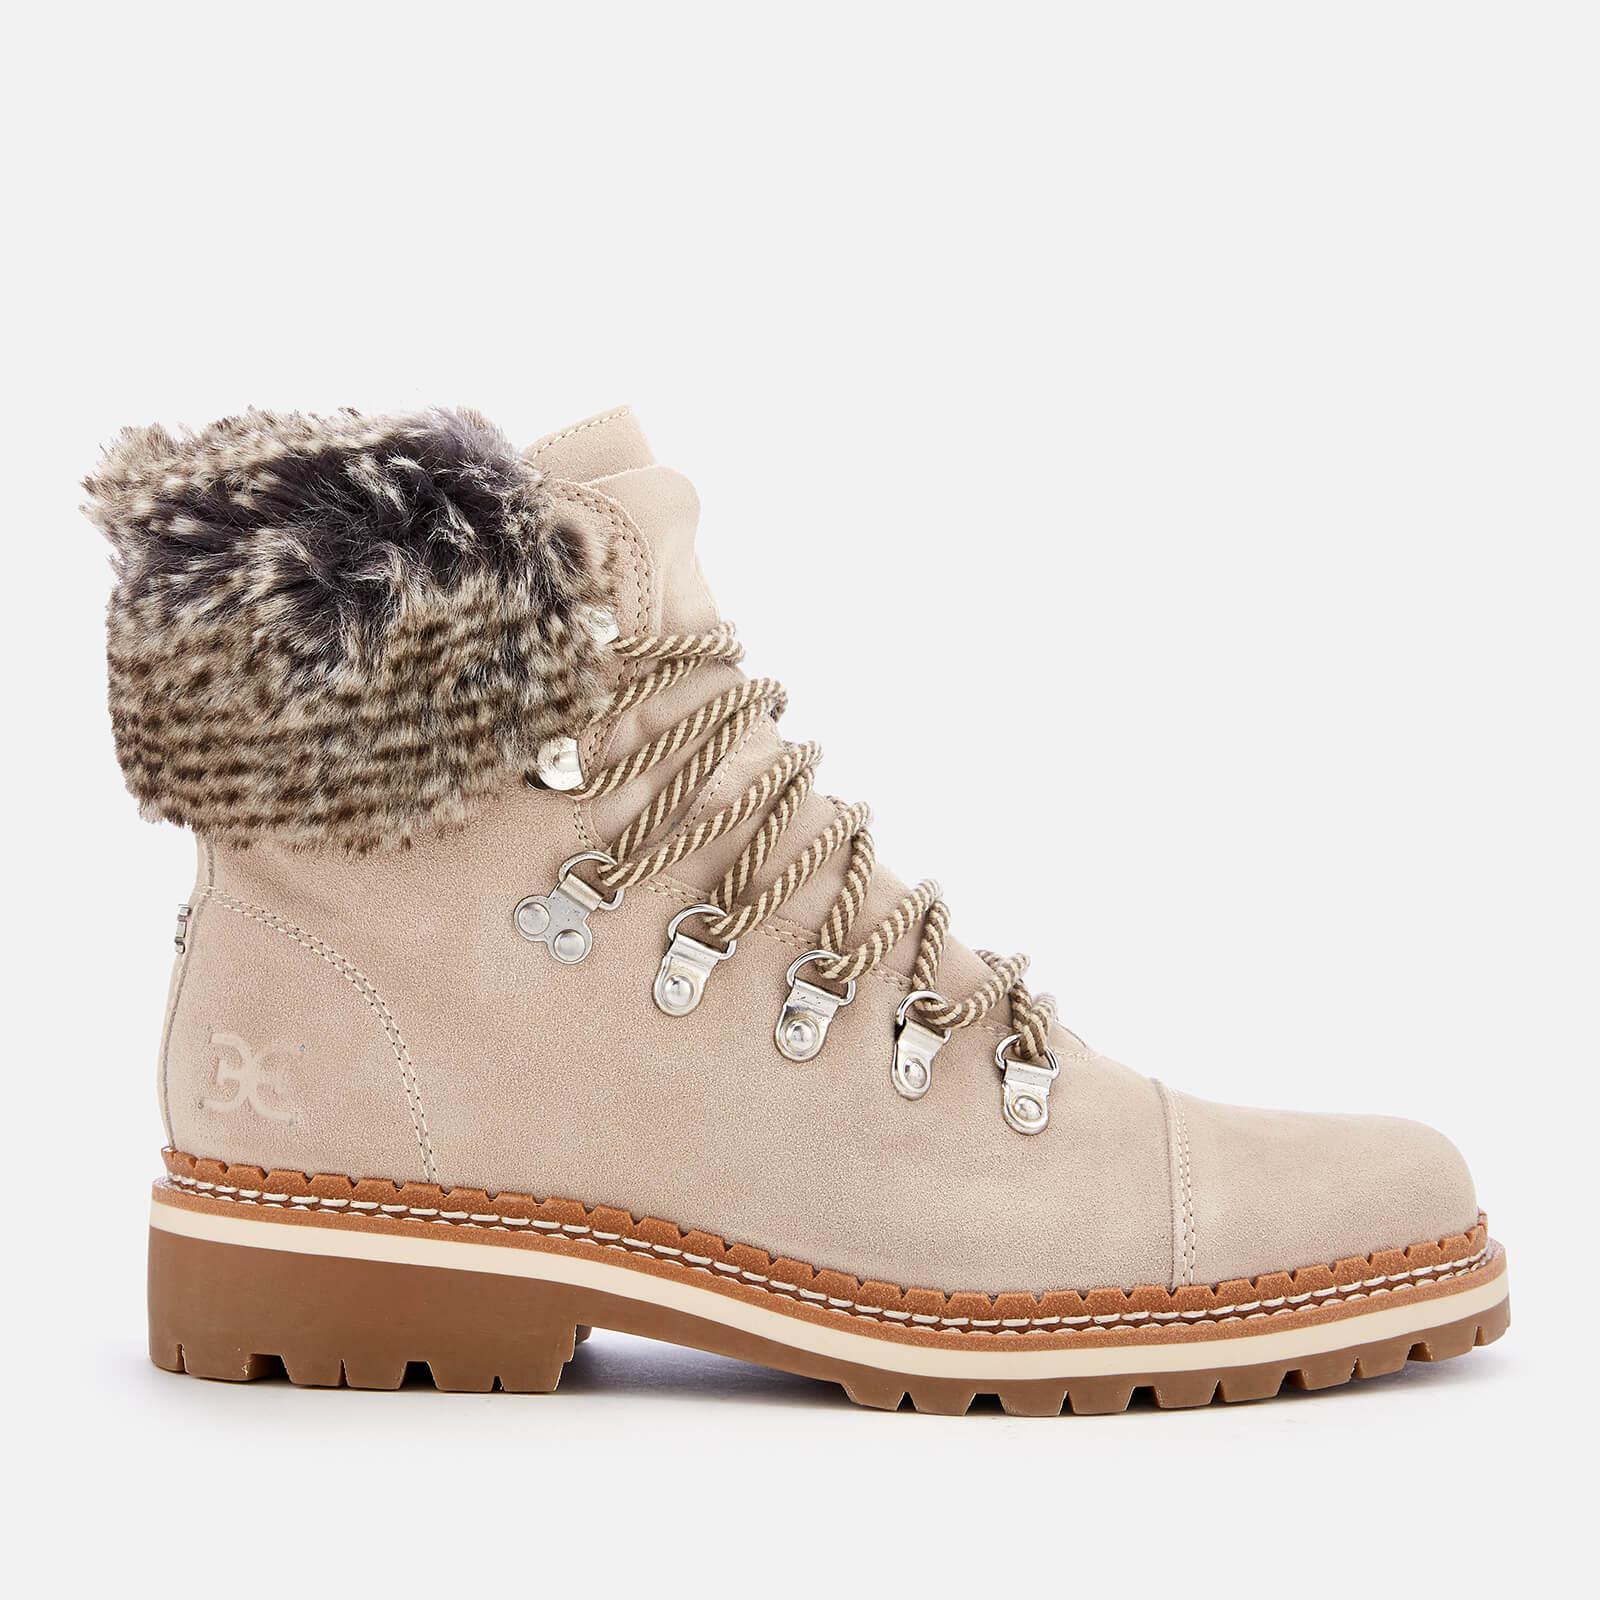 13796eea570a8 Sam Edelman Bowen Velutto Suede Hiker Style Boots in Gray - Lyst